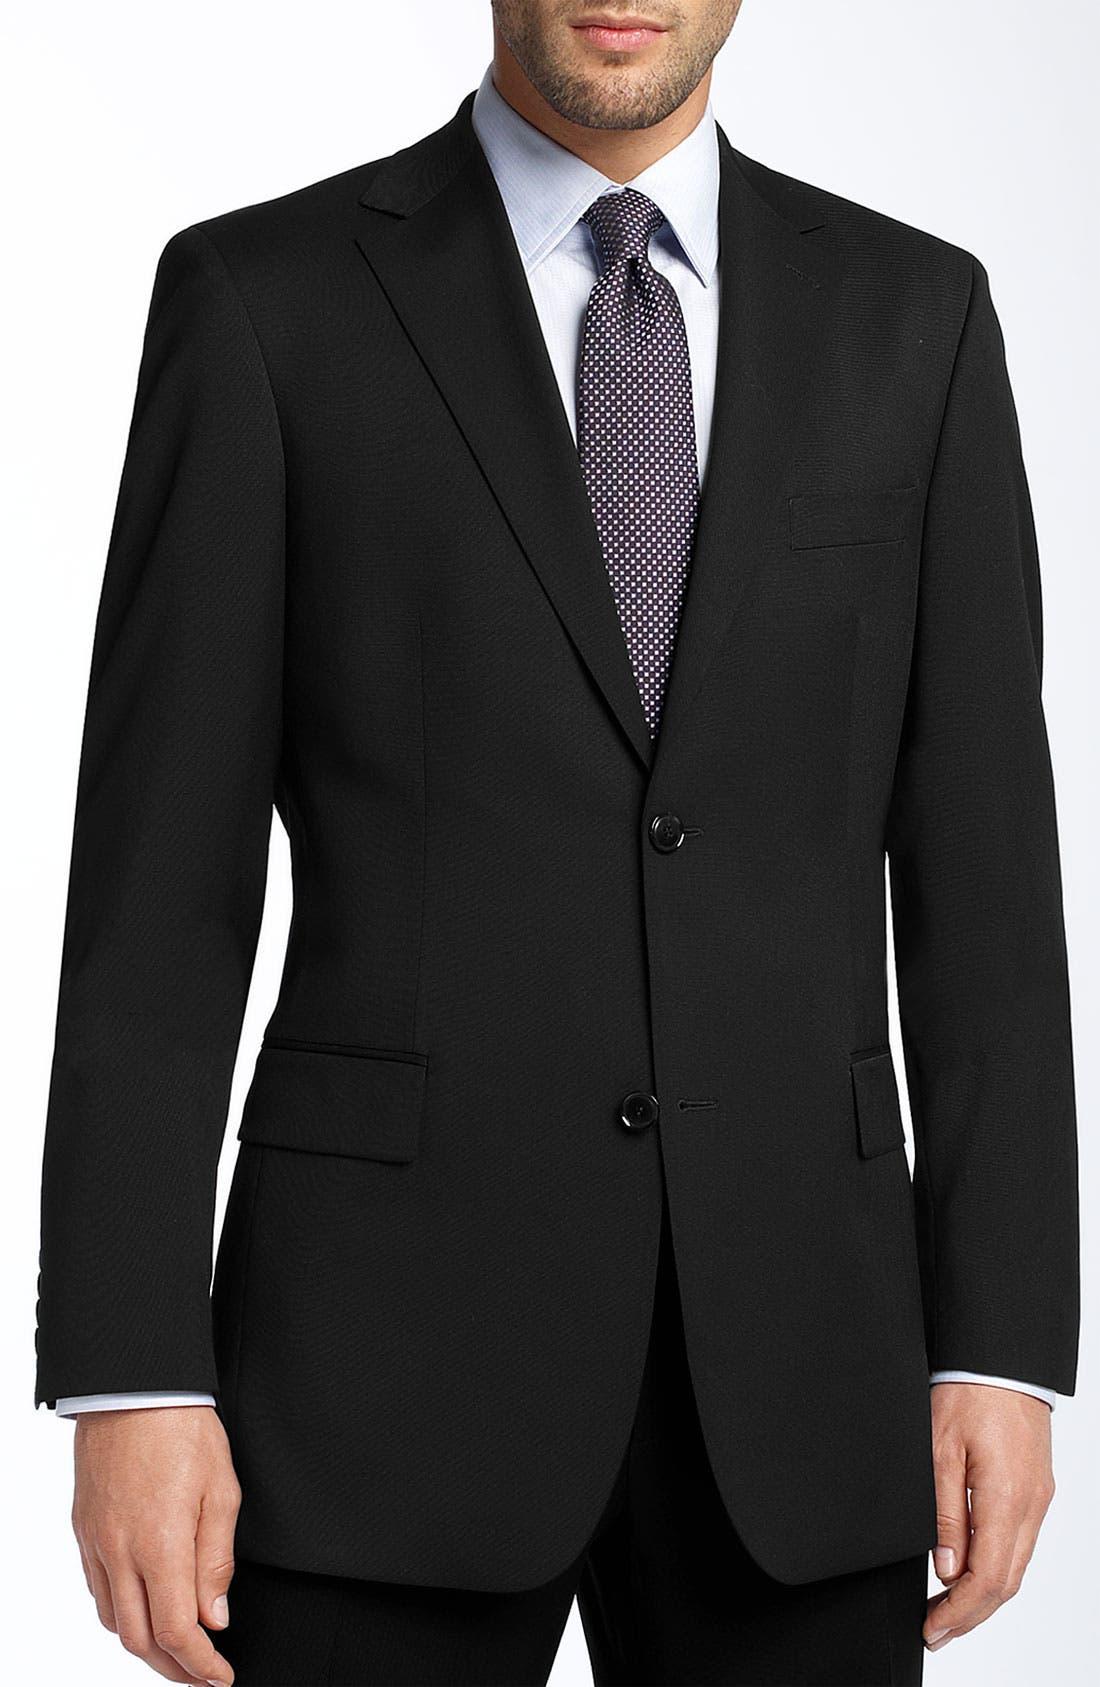 Main Image - BOSS HUGO BOSS 'Pasolini' Black Virgin Wool Sportcoat